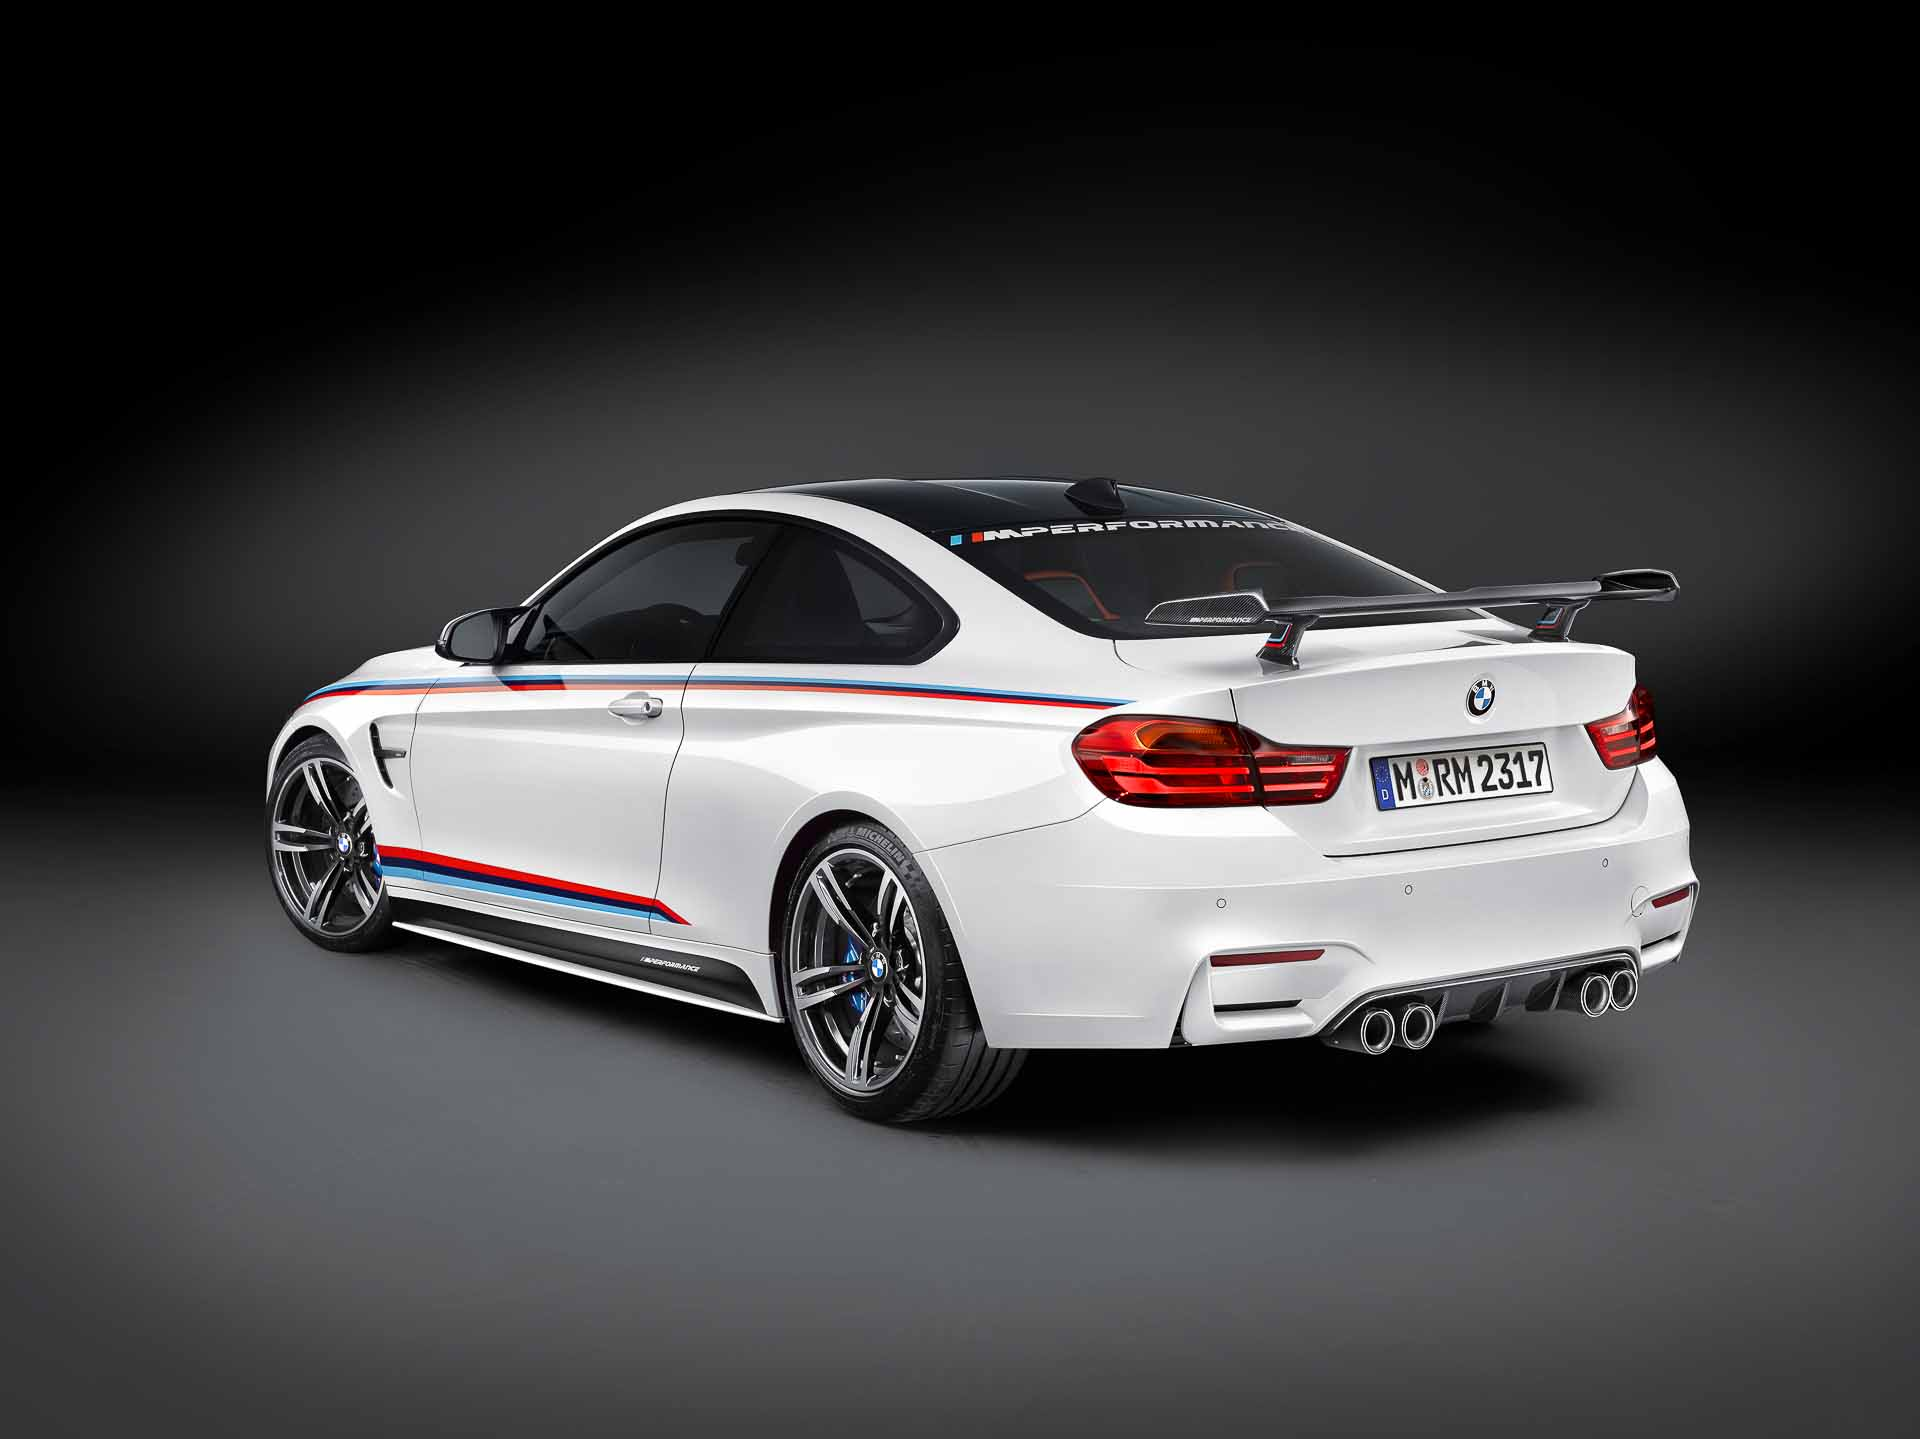 , BMW 4 Series / M4, Pitlane Tuning Shop